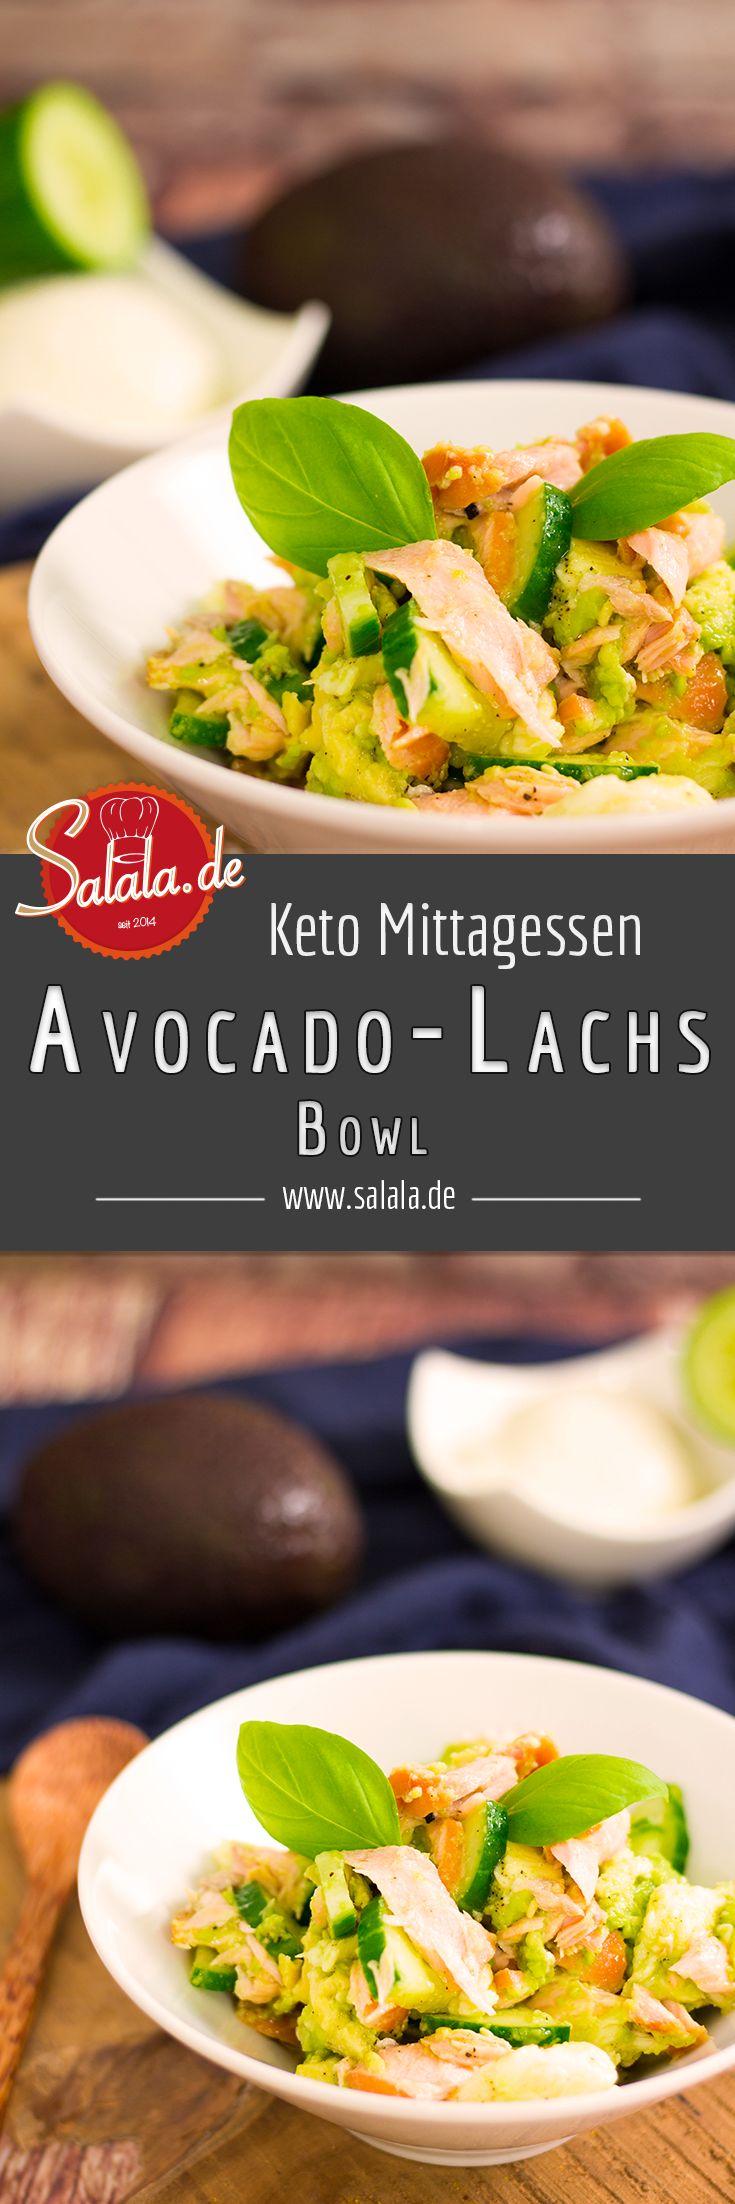 Avocado-Lachs Bowl